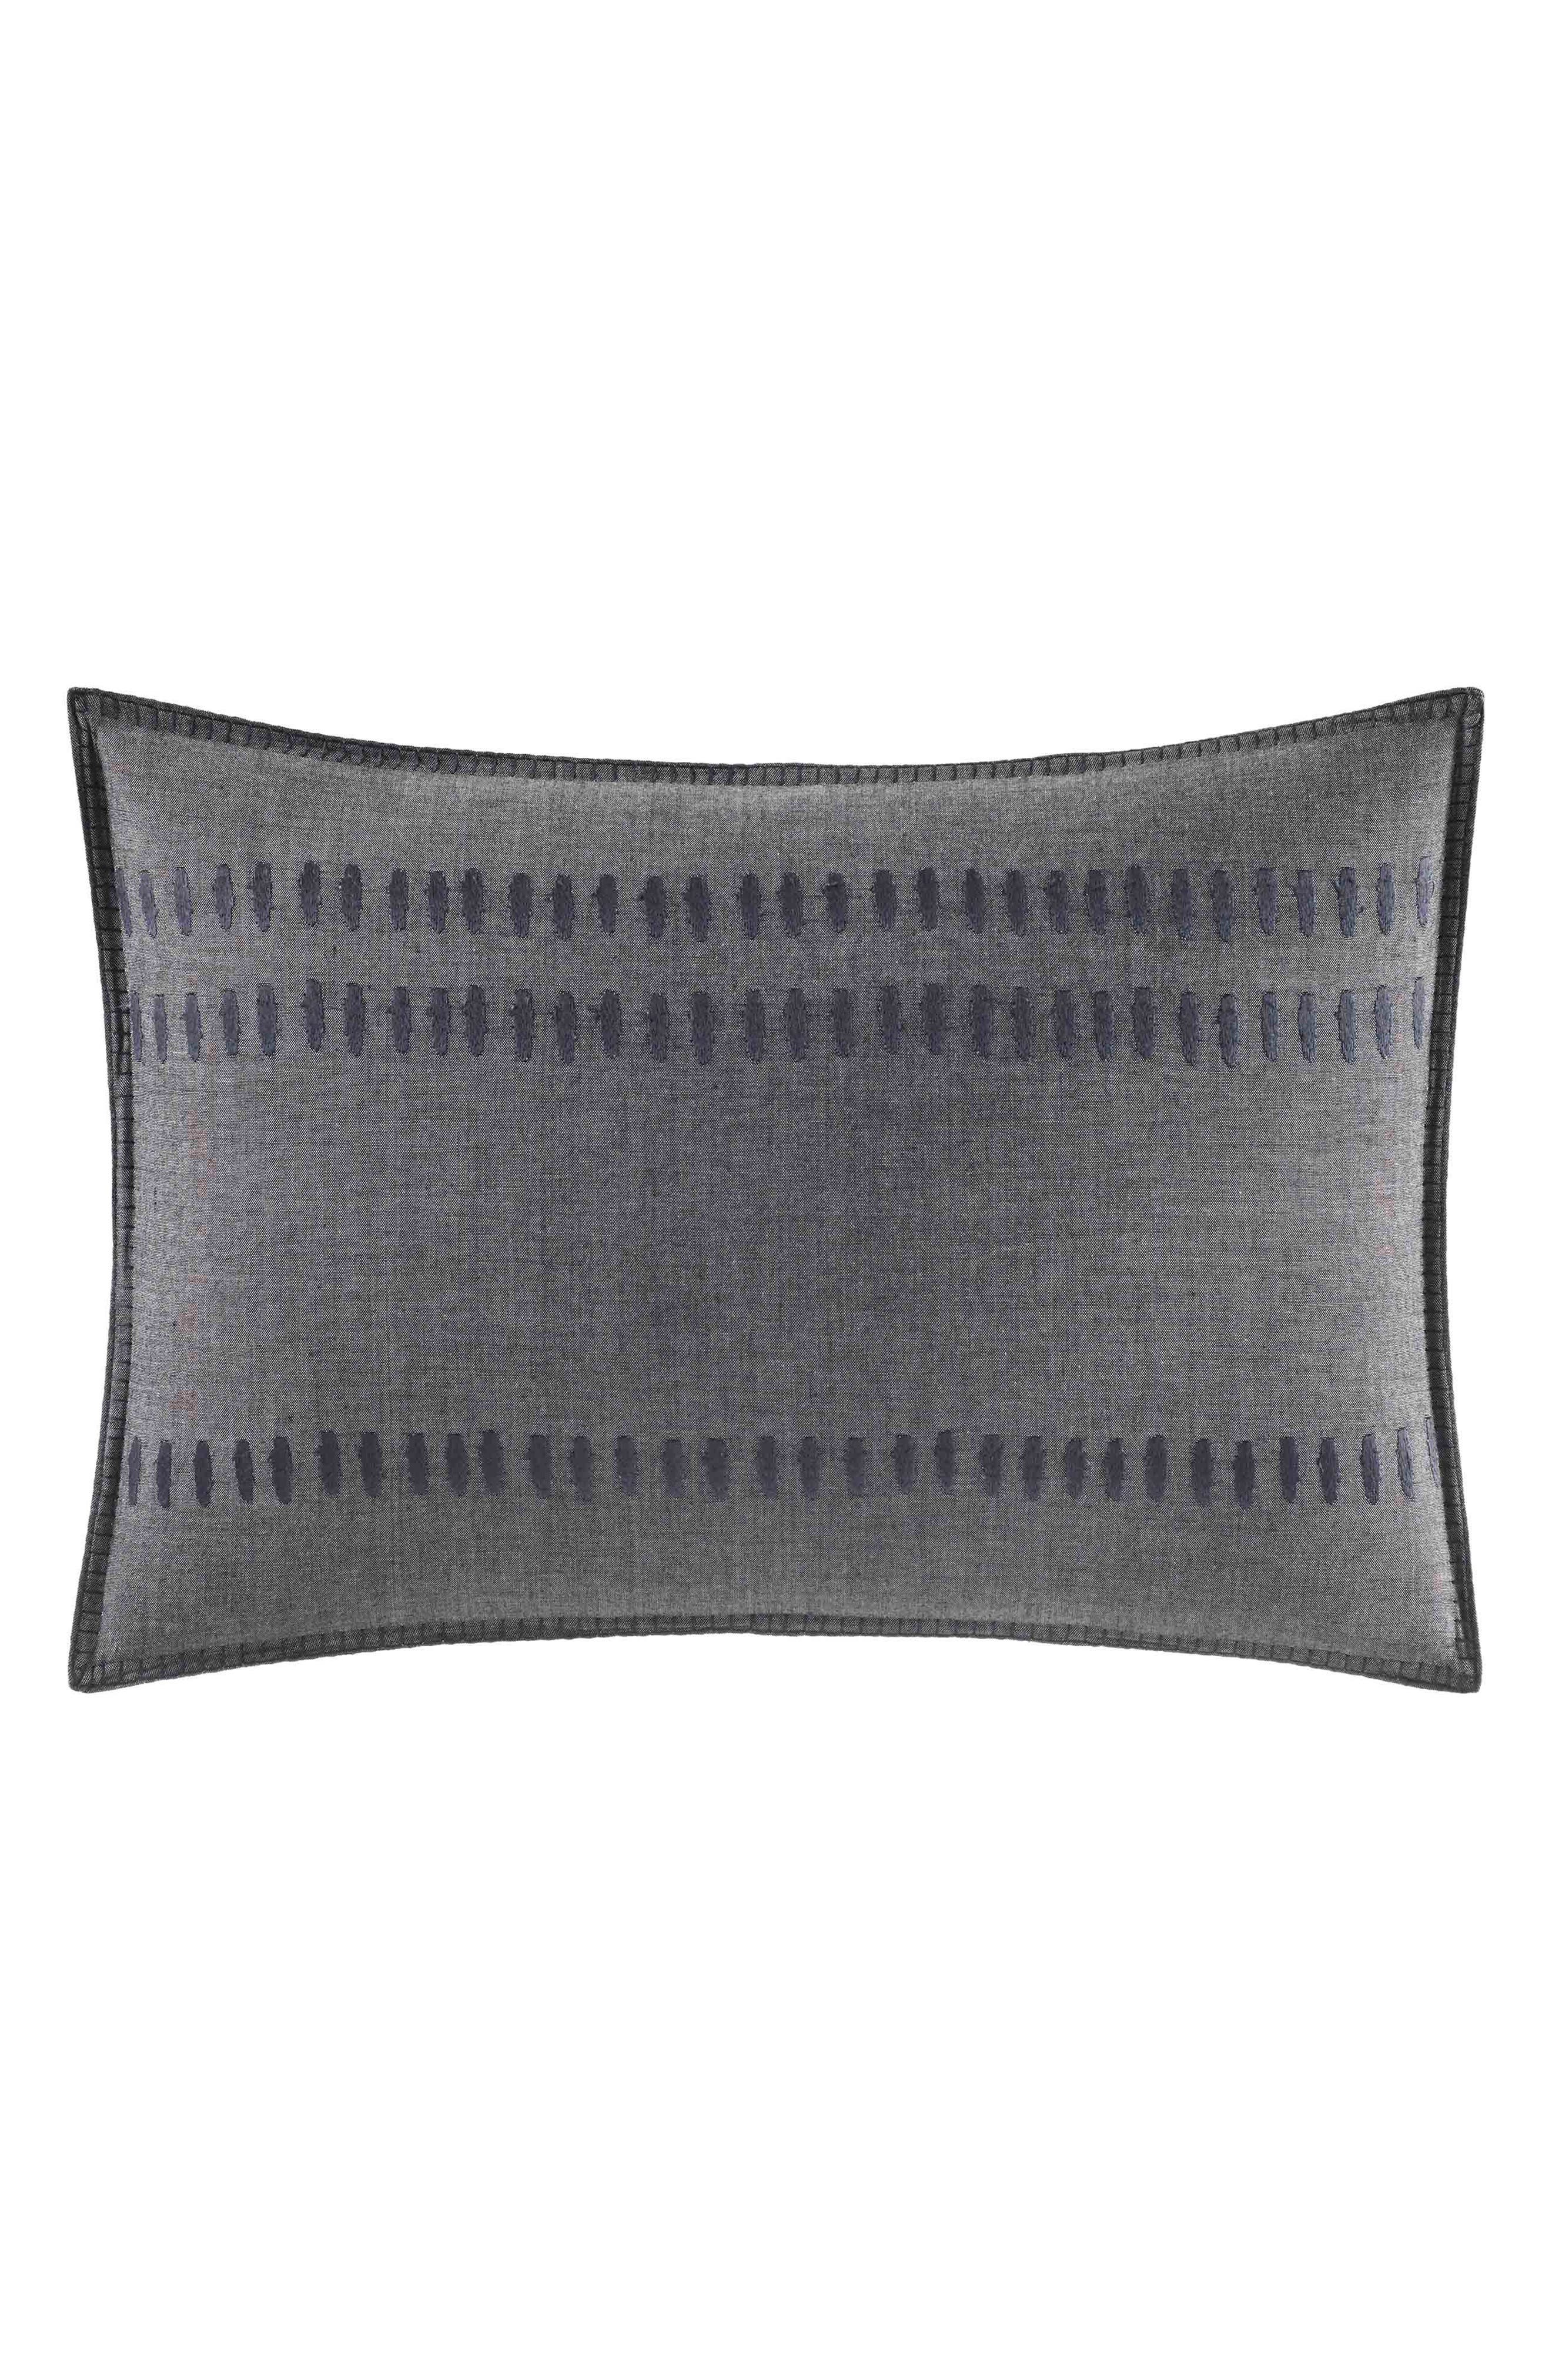 ED ELLEN DEGENERES Nomad Stitched Accent Pillow, Main, color, DARK GREY